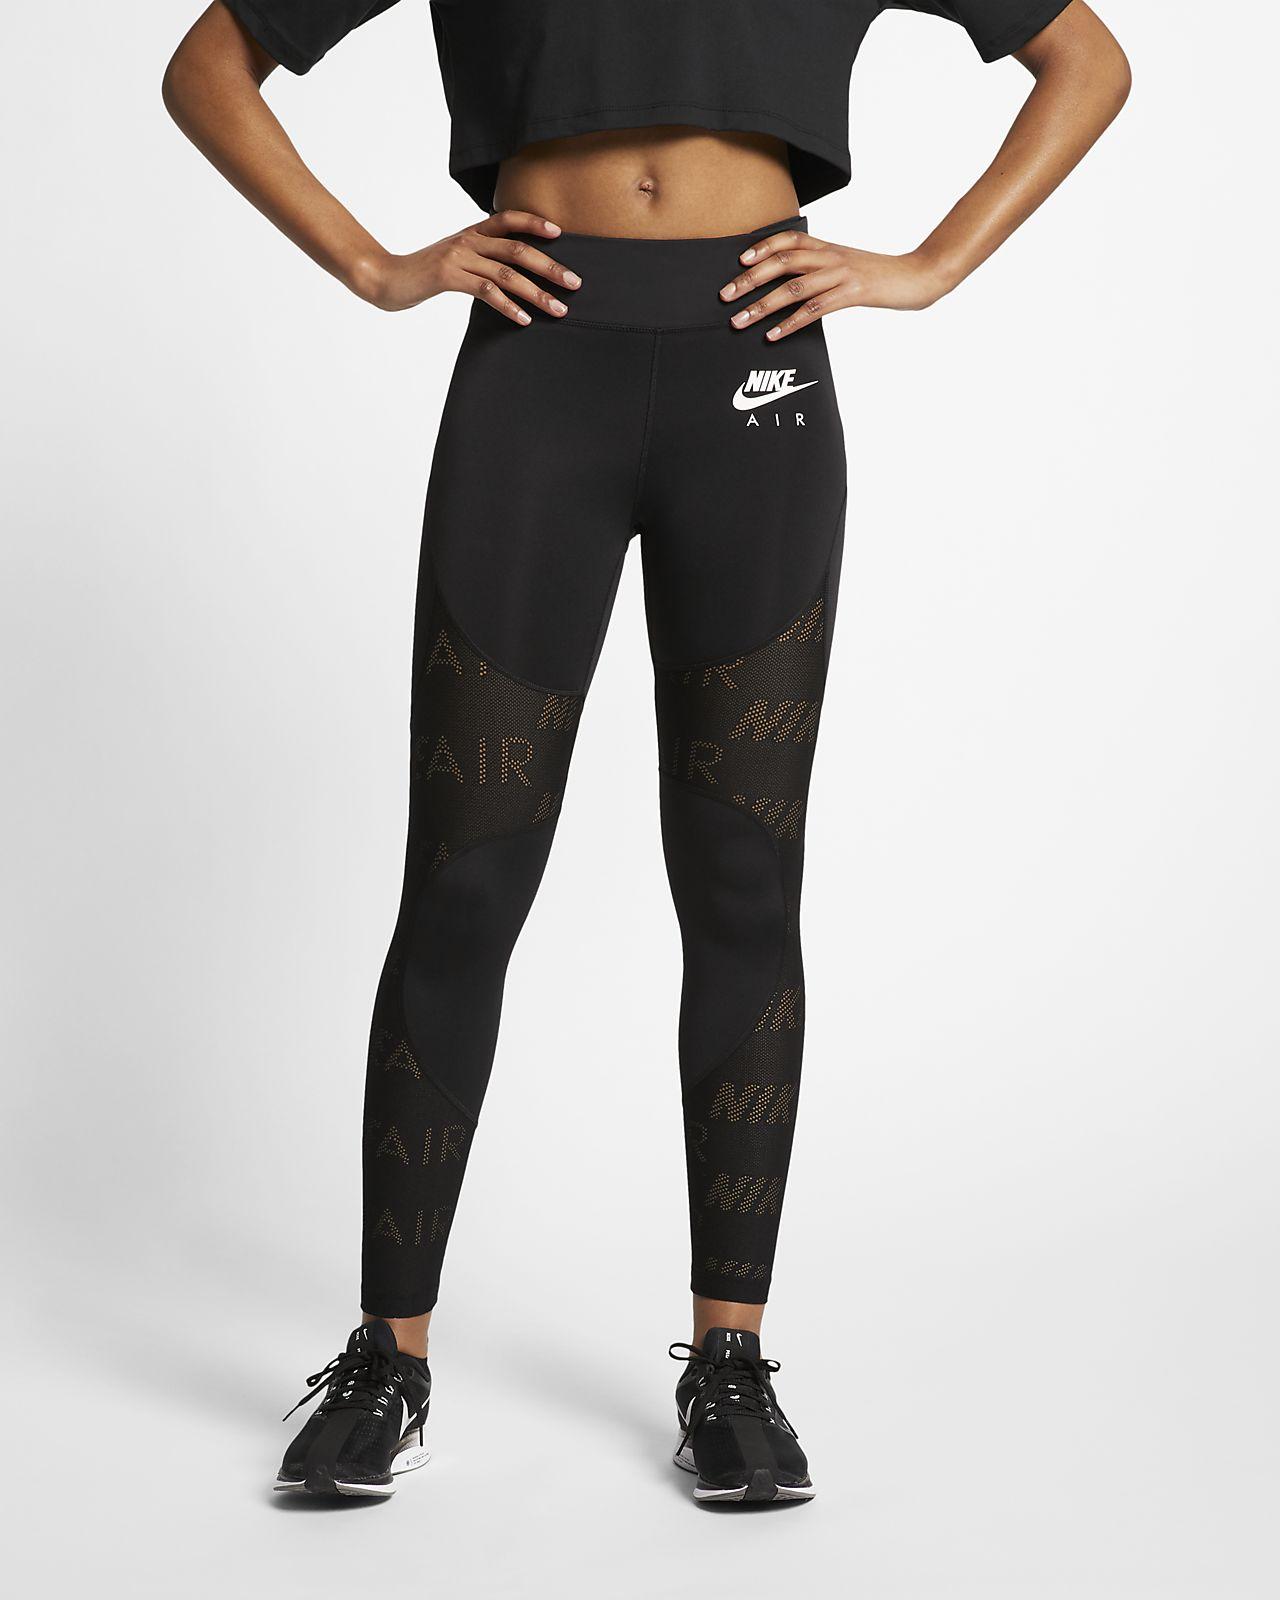 Nike Air Fast Women's 7/8 Running Tights